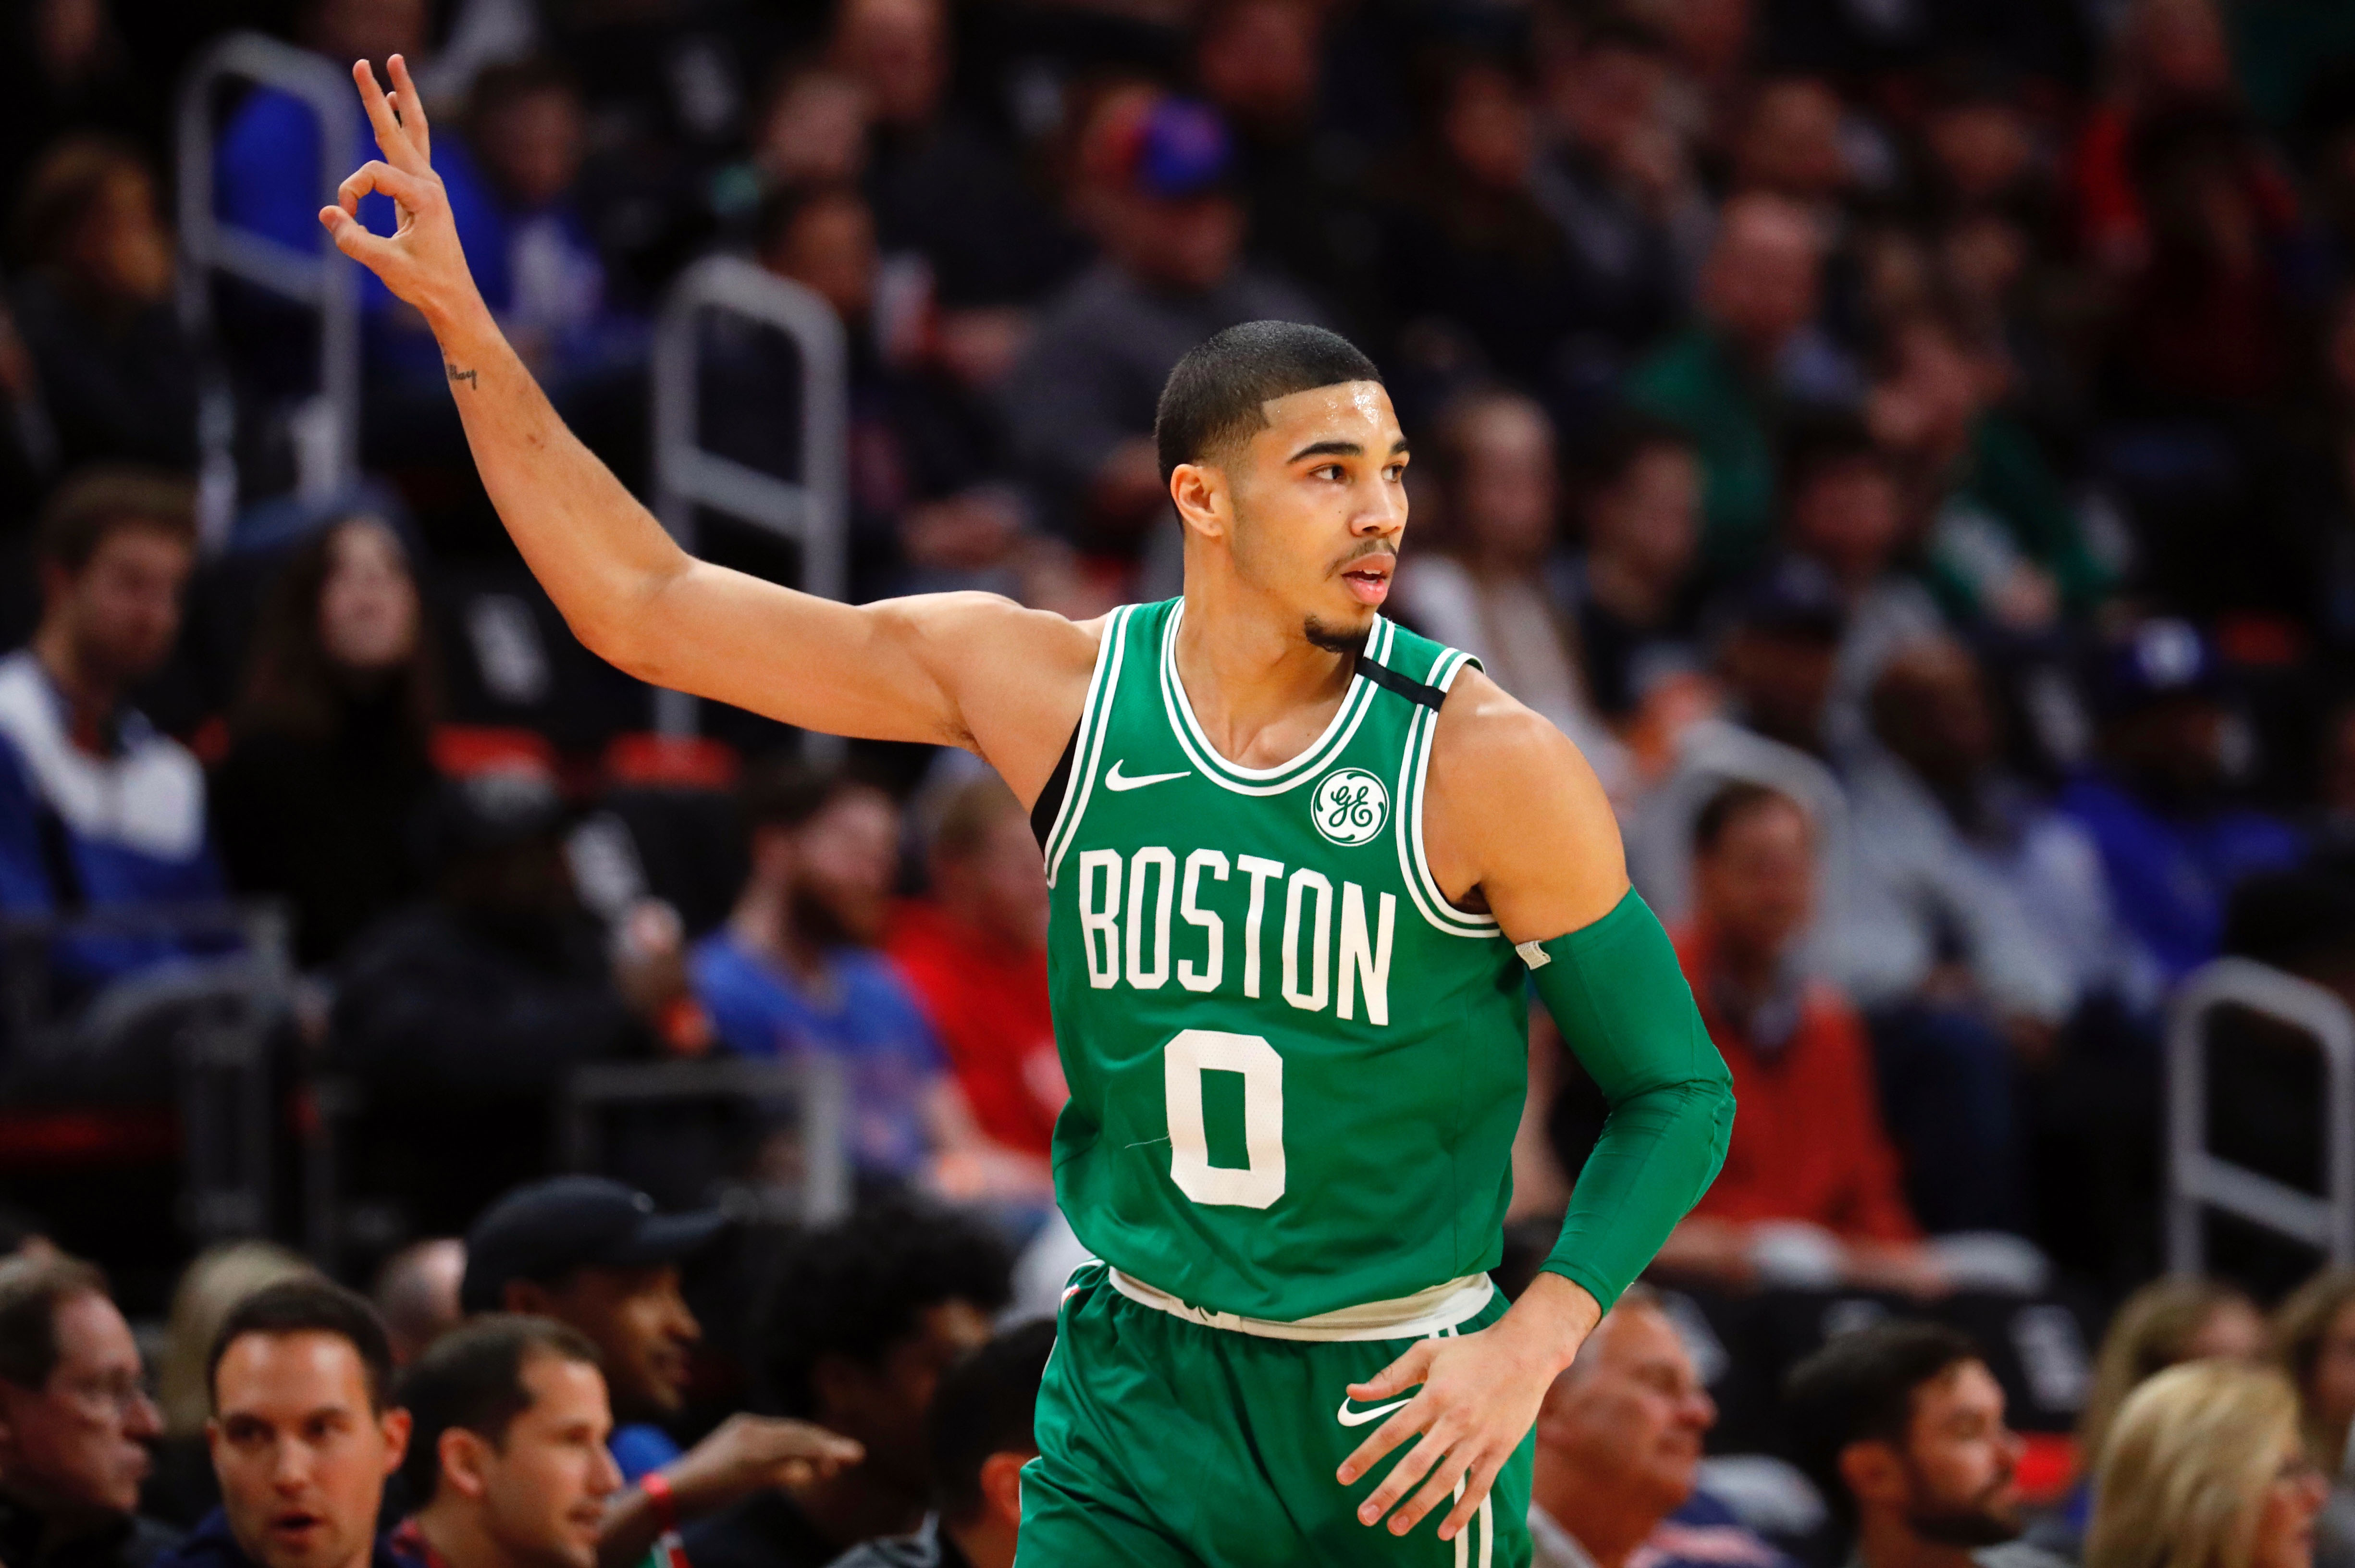 2018 Boston Celtics >> Boston Celtics back (to back) on the court as they visit the Phoenix Suns - CelticsBlog